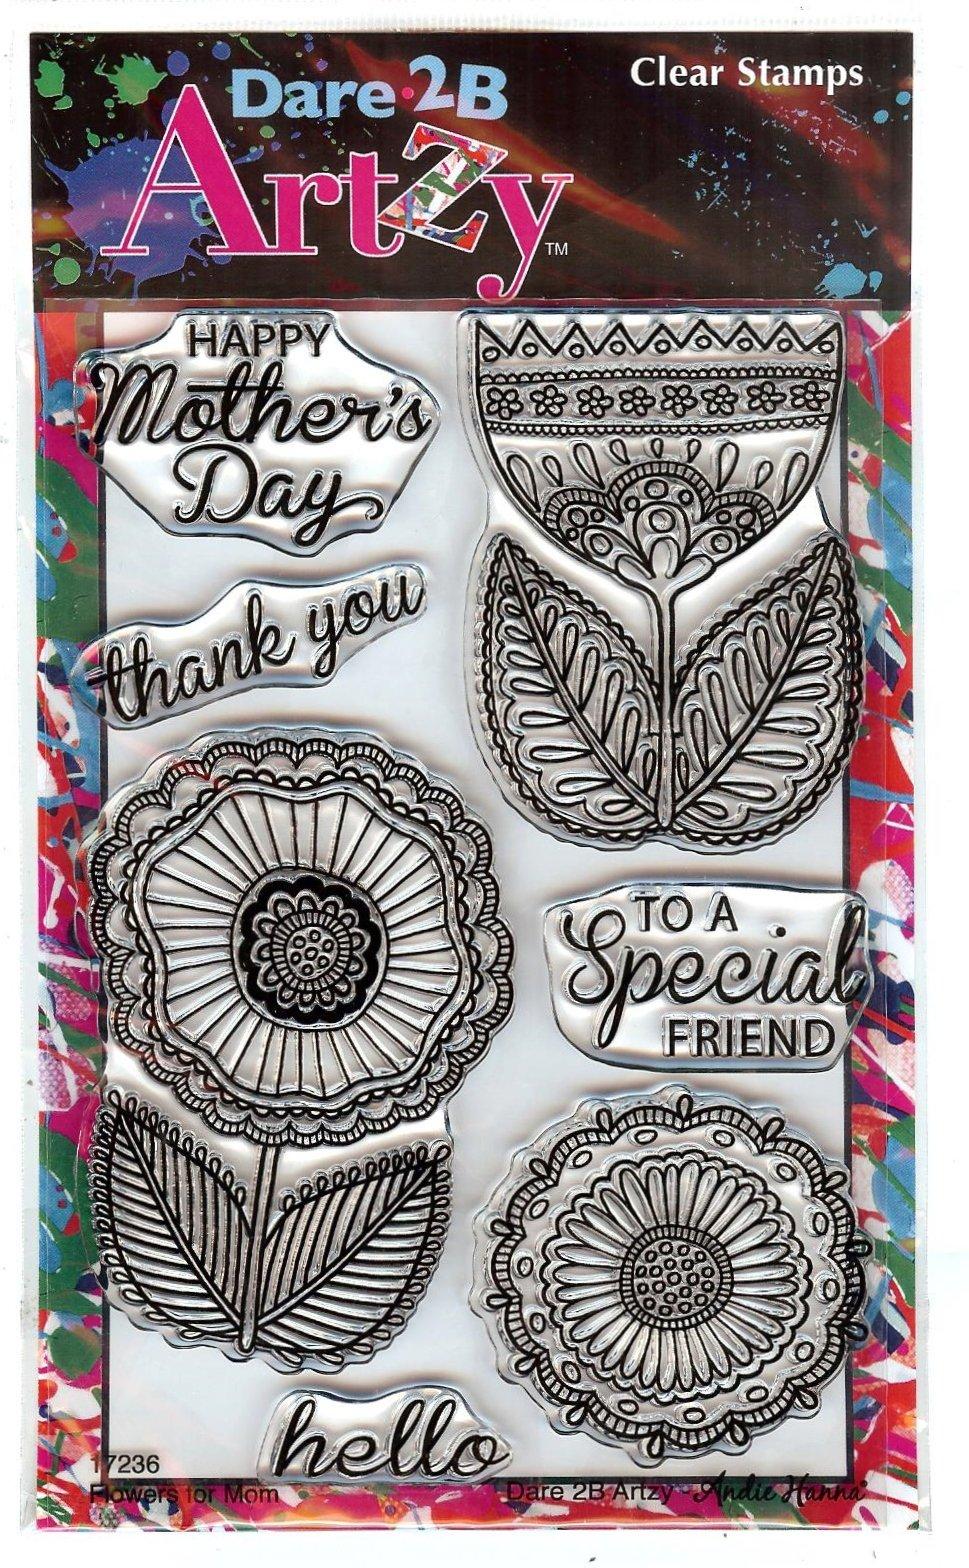 Dare 2B Artzy - Flowers 4 Mom, Clear Stamp Set